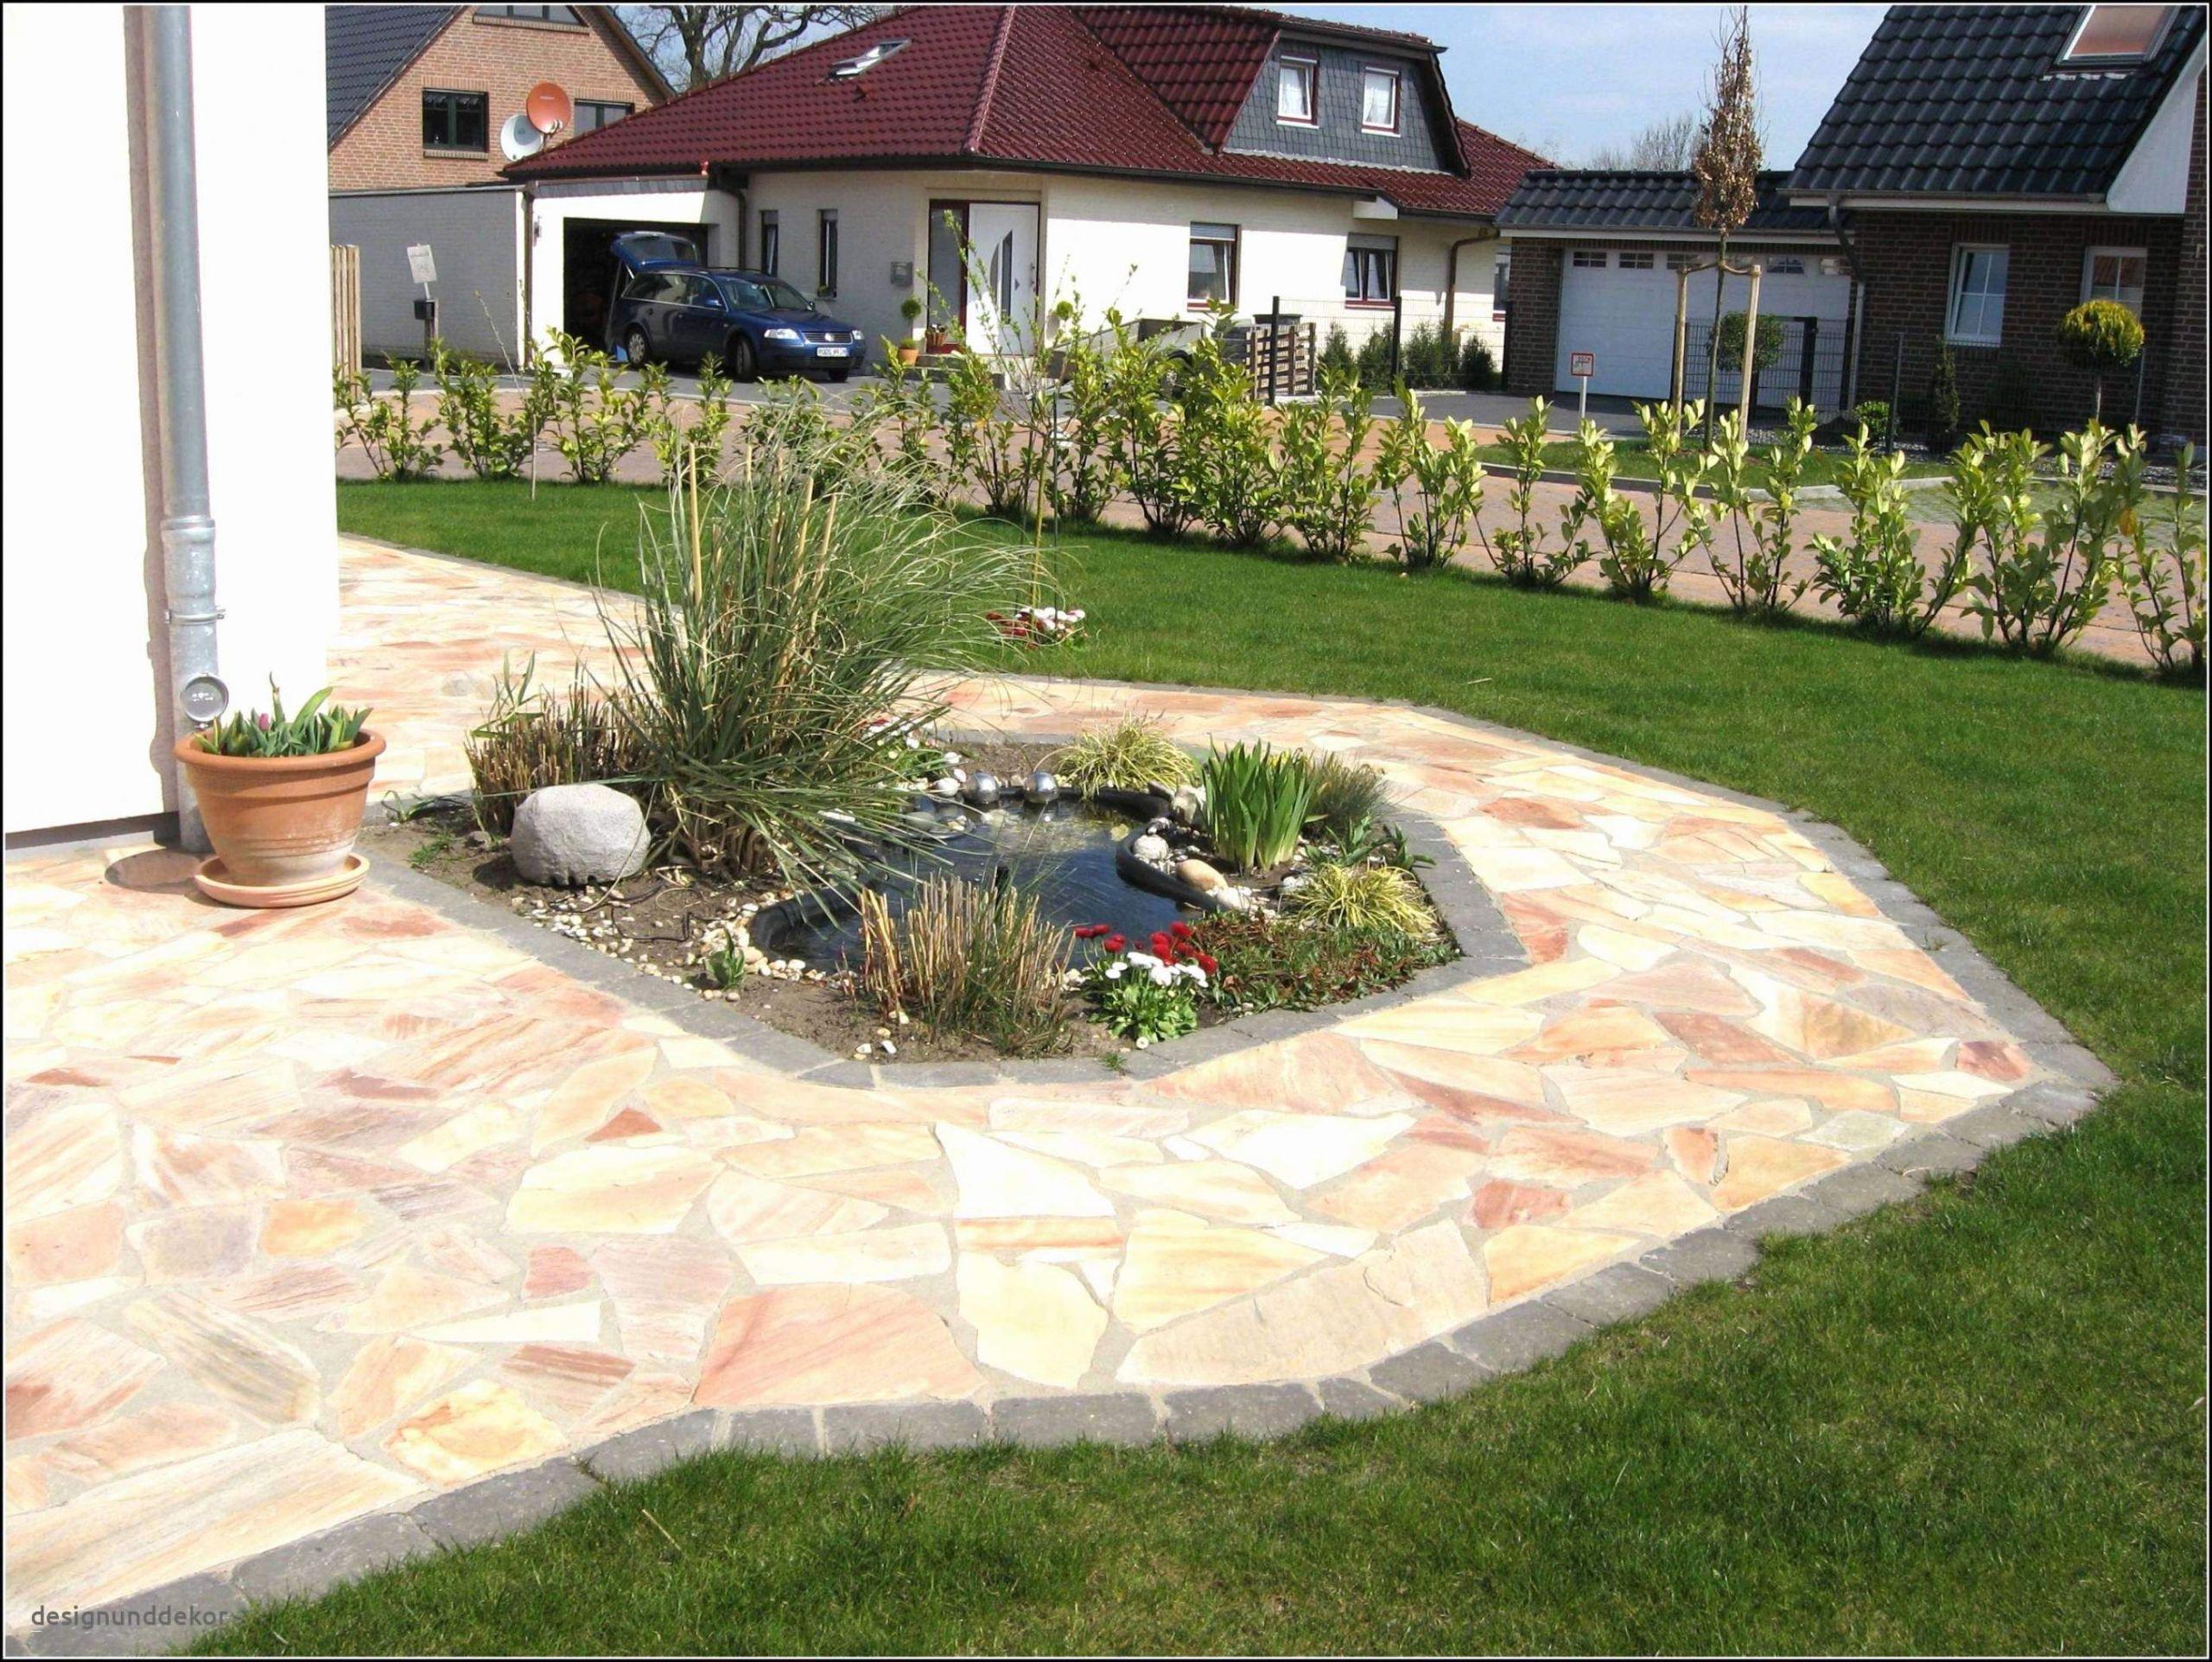 Terrasse Beet Gestalten Elegant 36 Luxus Garten Am Hang Ideen Bilder Inspirierend